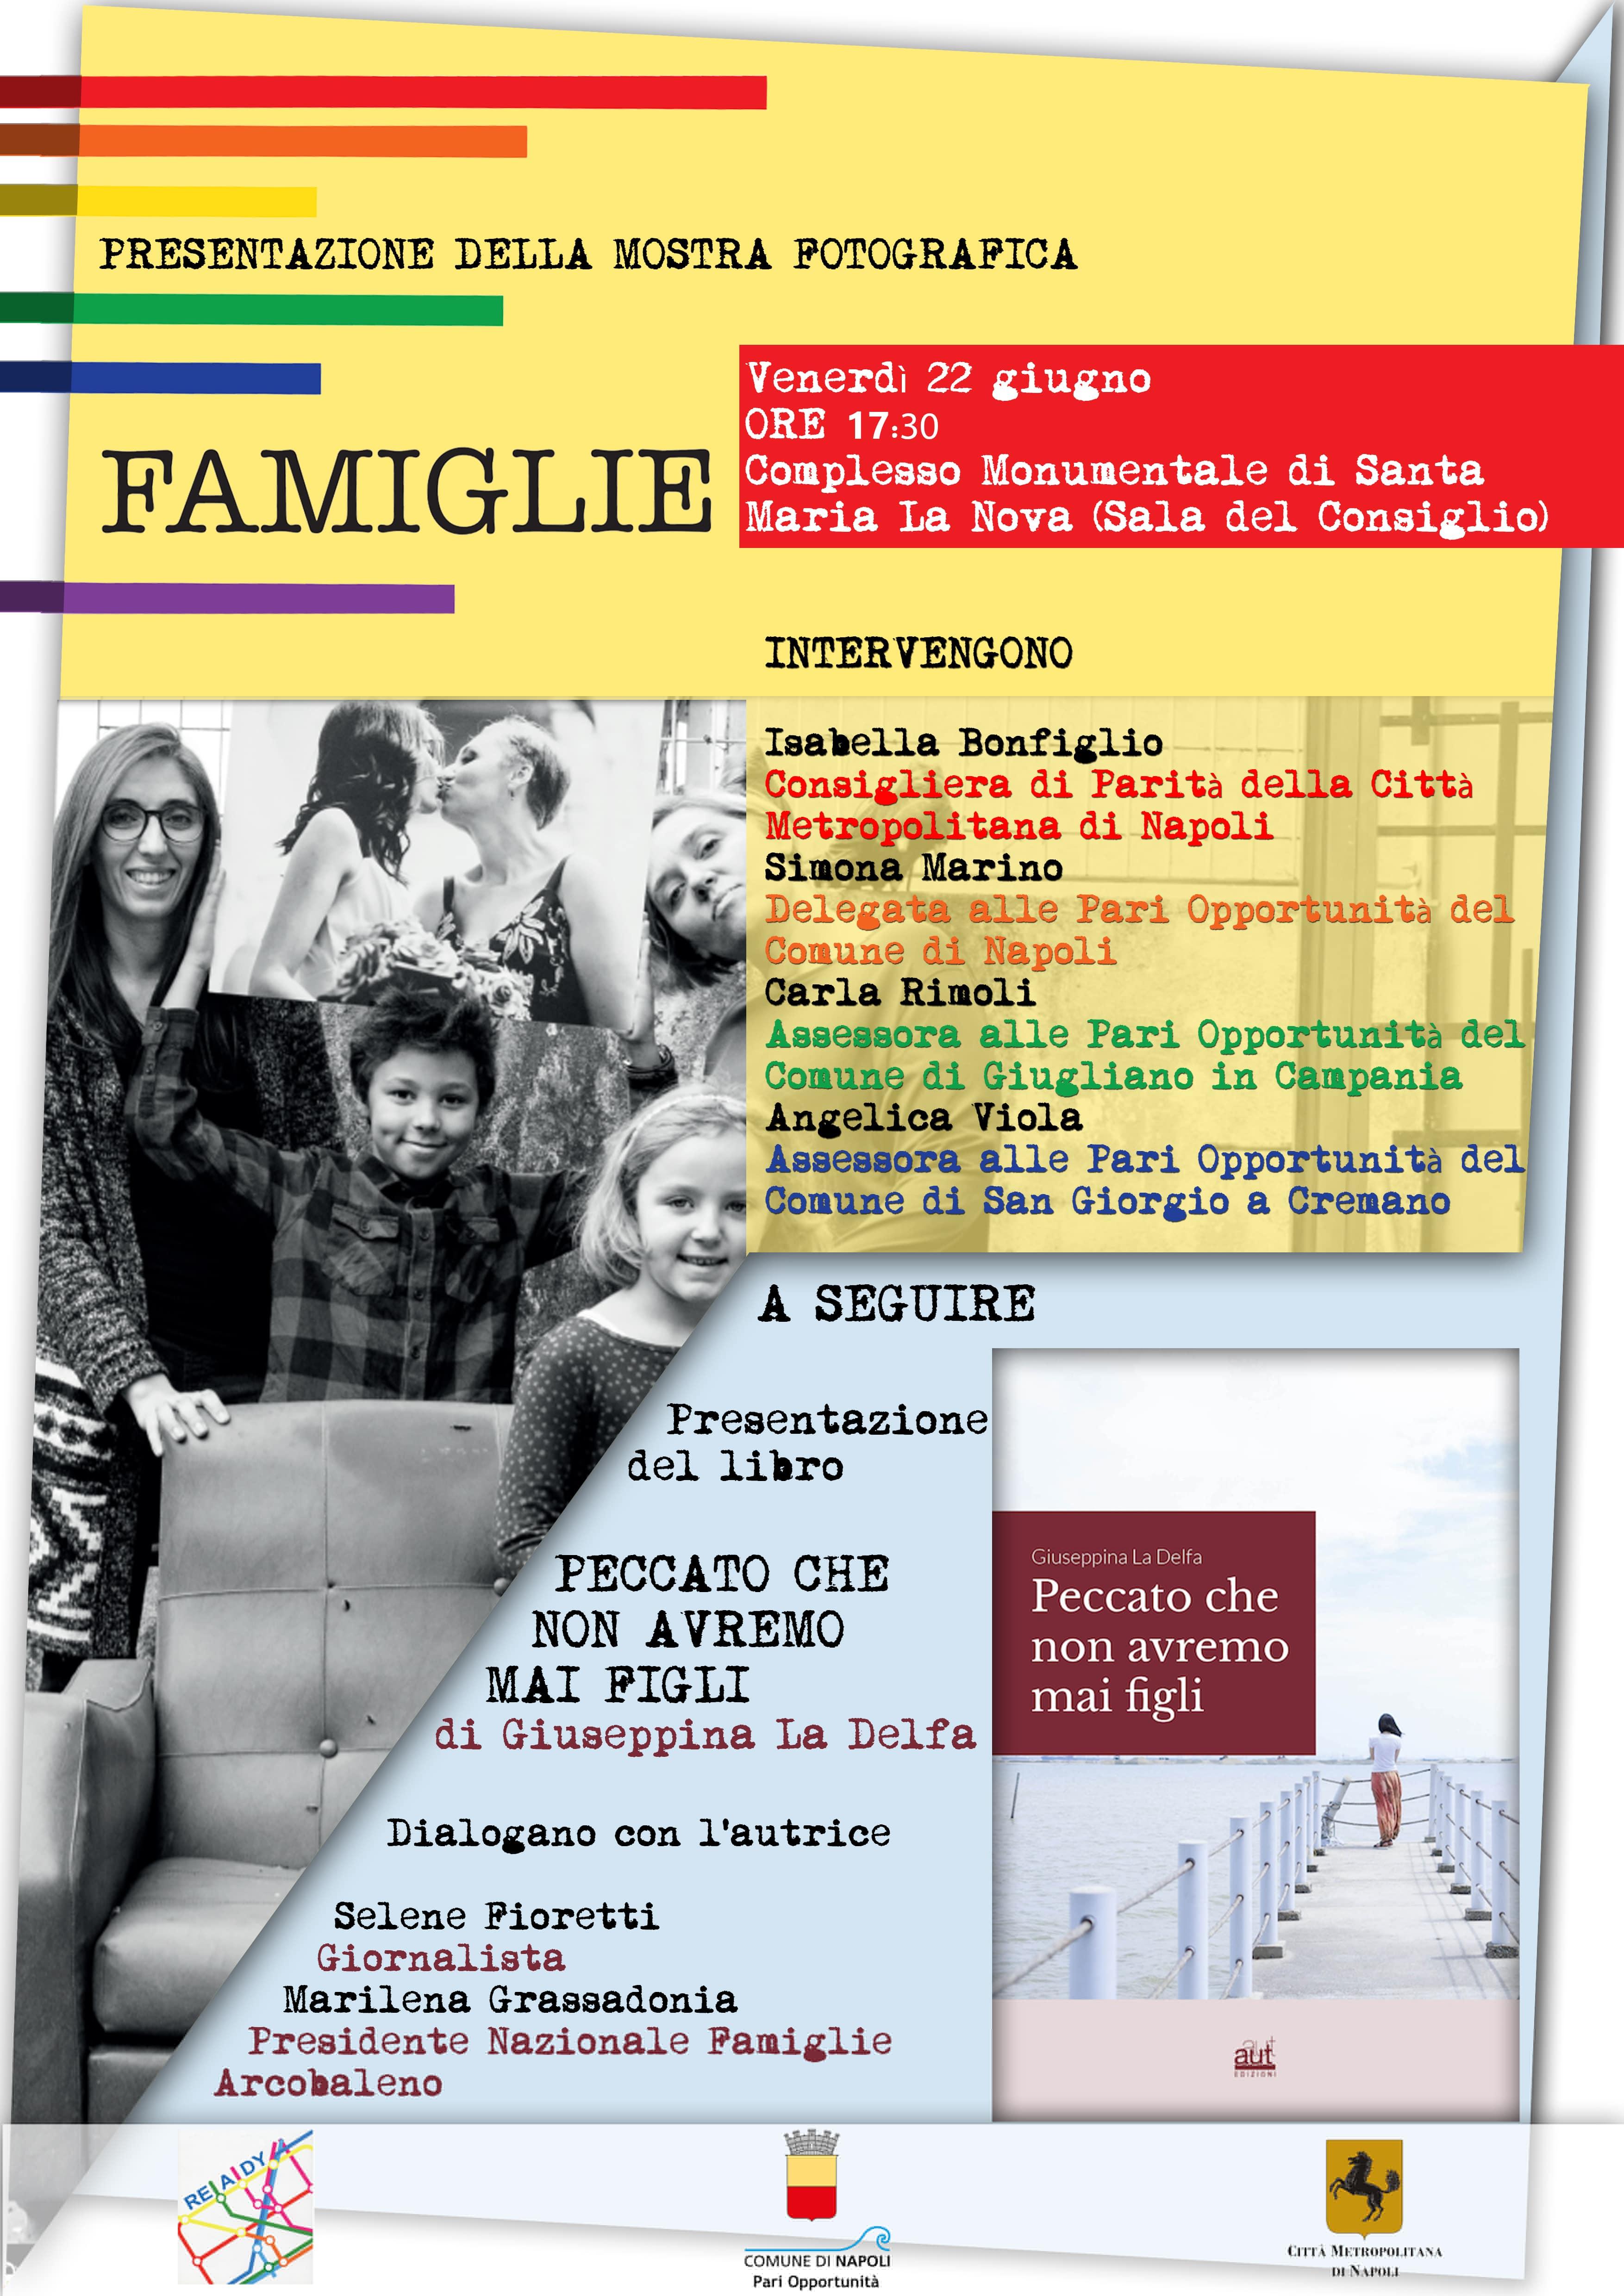 Vernissage Mostra Famiglie Arcobaleno Santa Maria La Nova